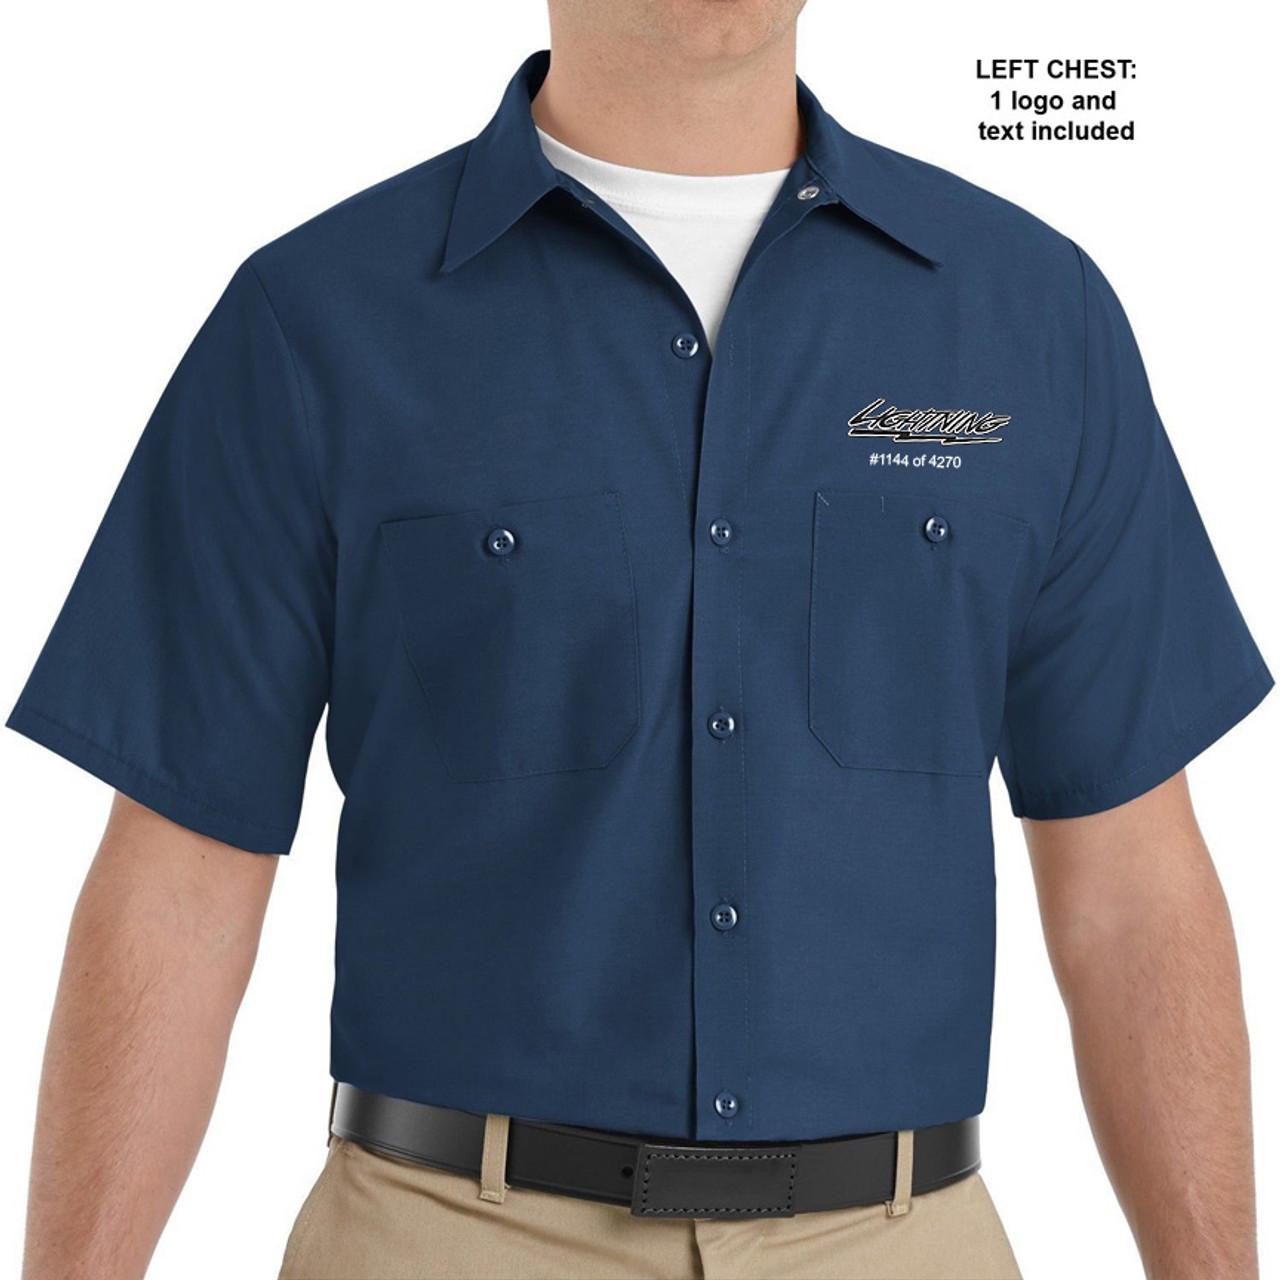 Customizable Apparel - Shirts and Jackets